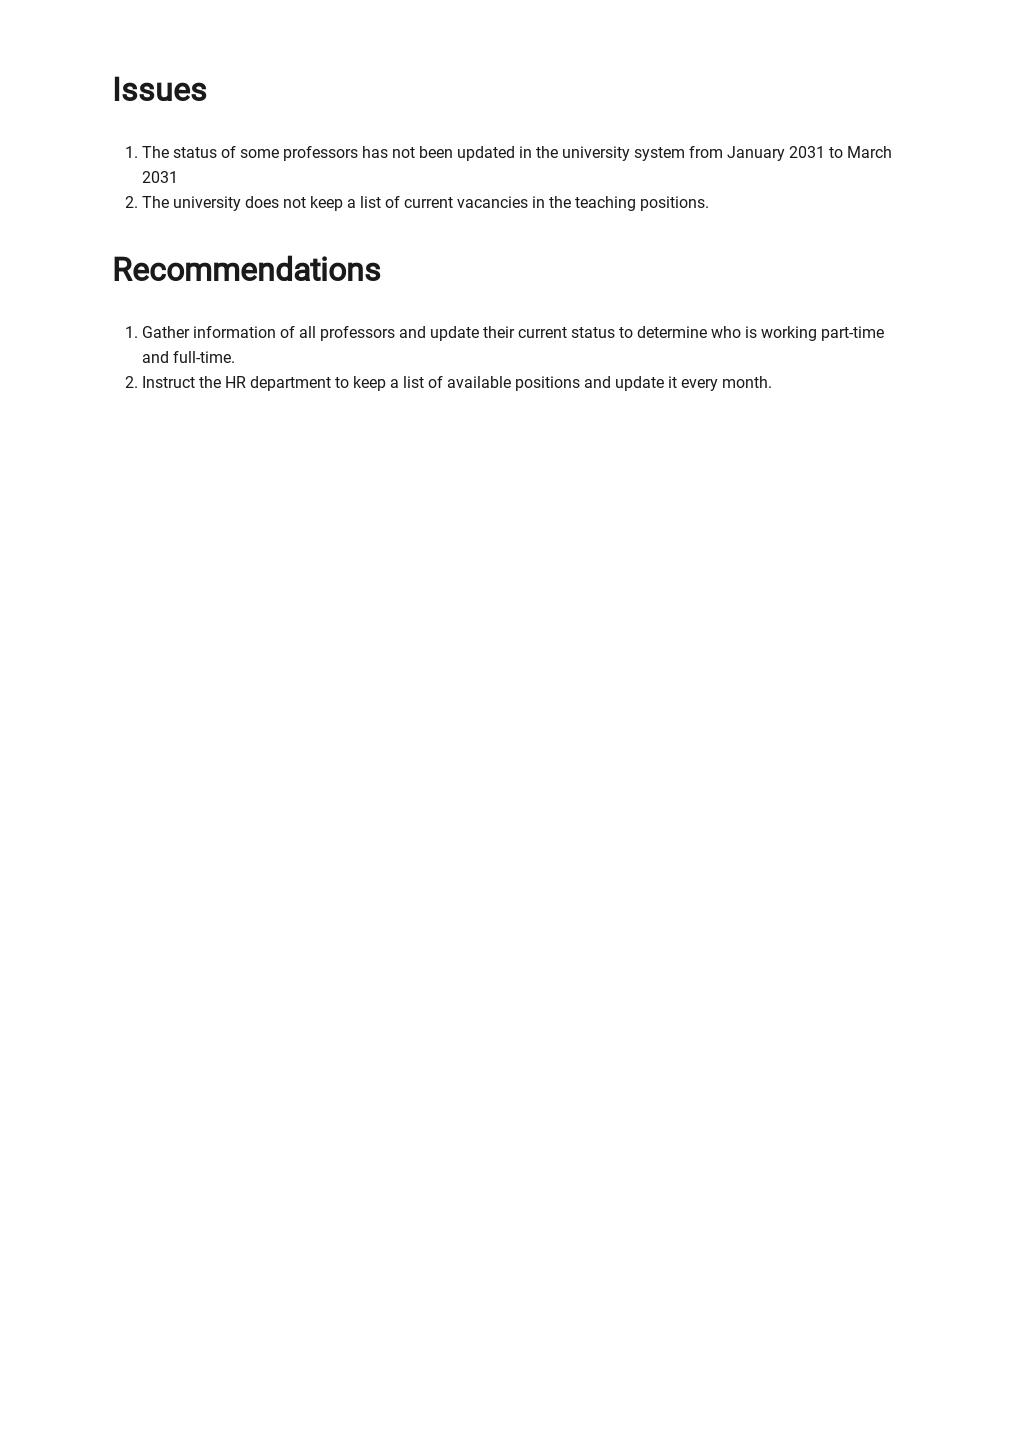 Free Sample University Report Template 2.jpe